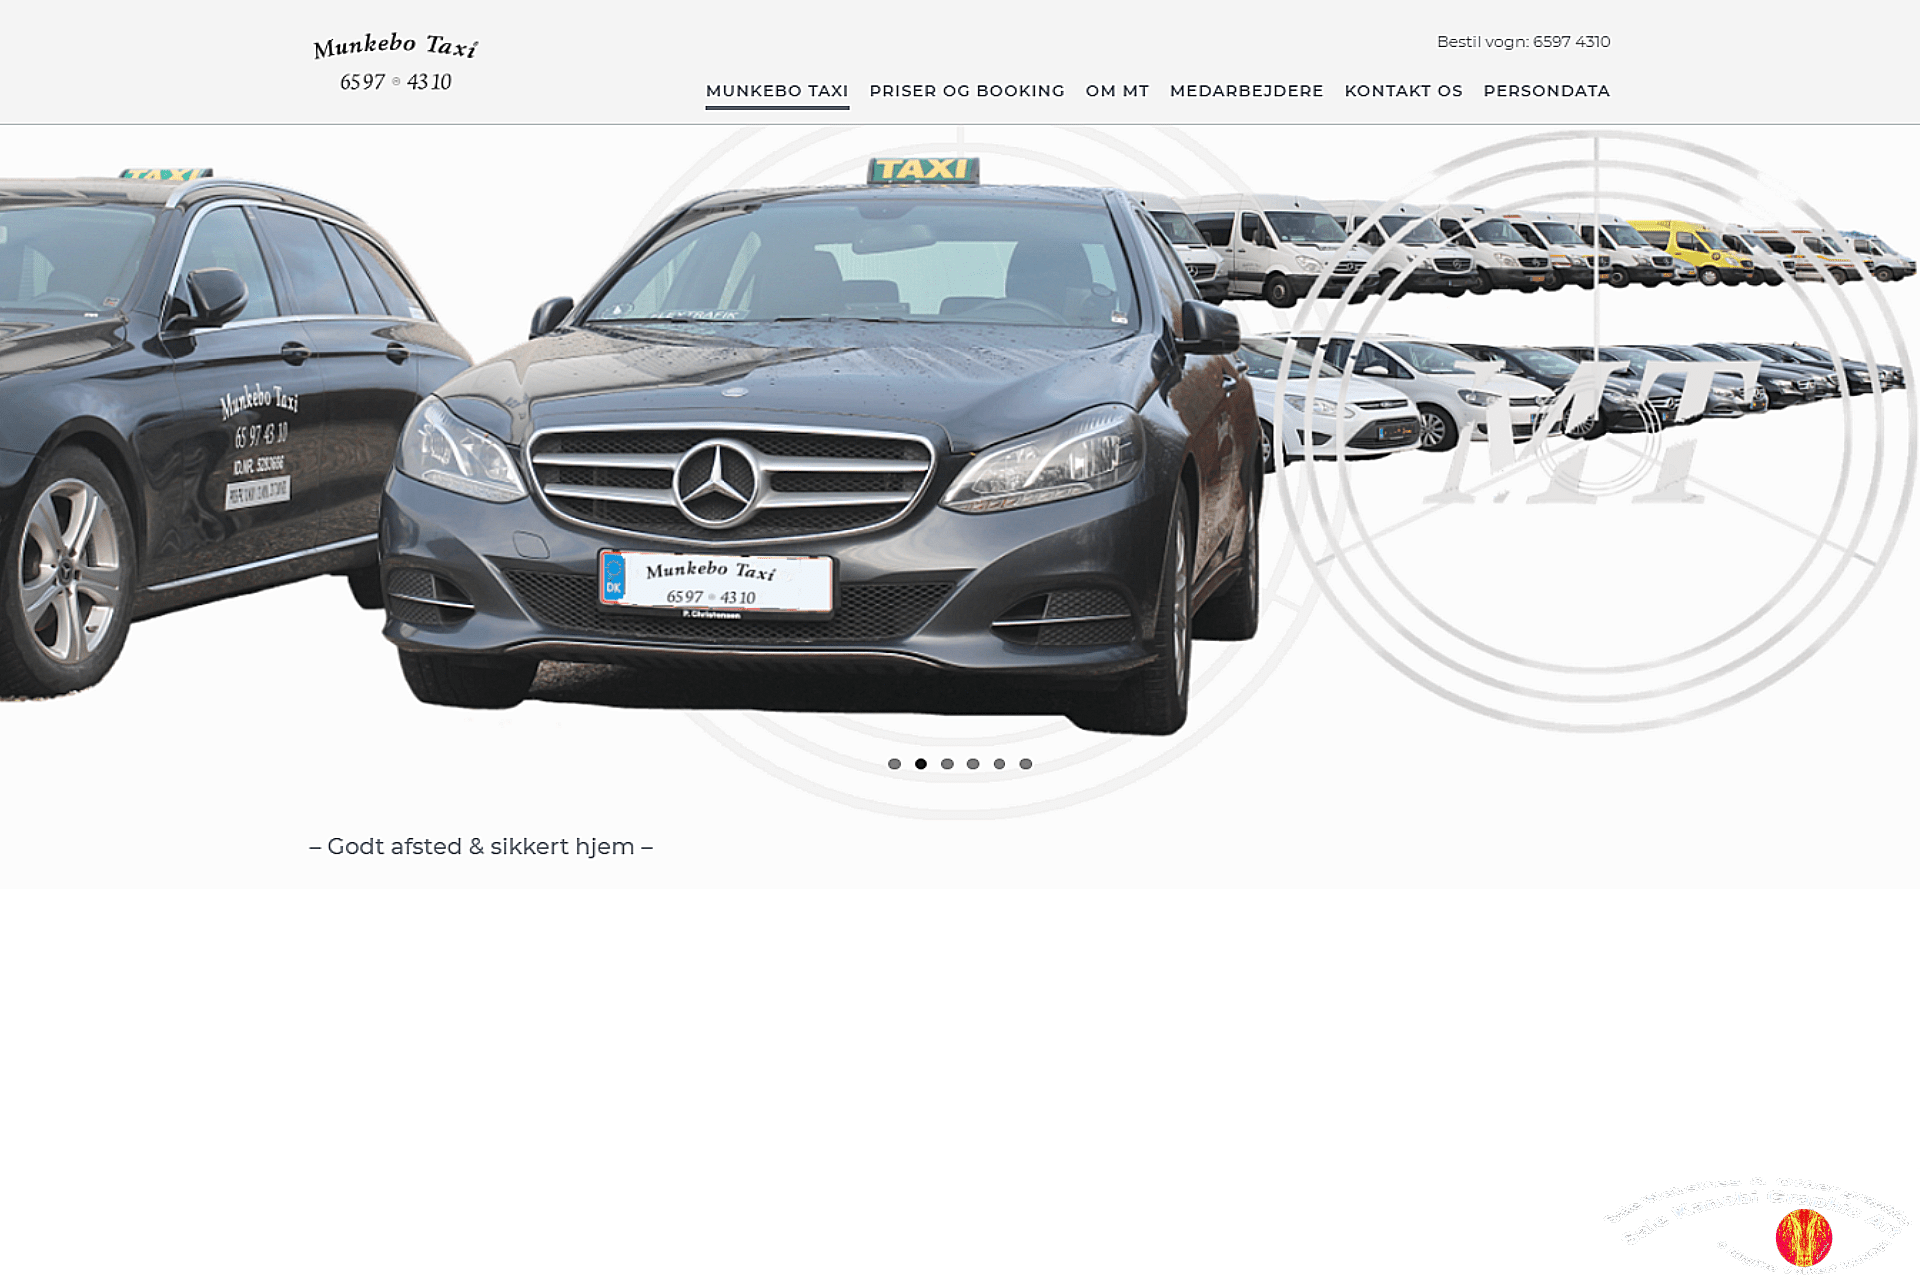 Munkebo Taxi https://www.munkebotaxi.dk